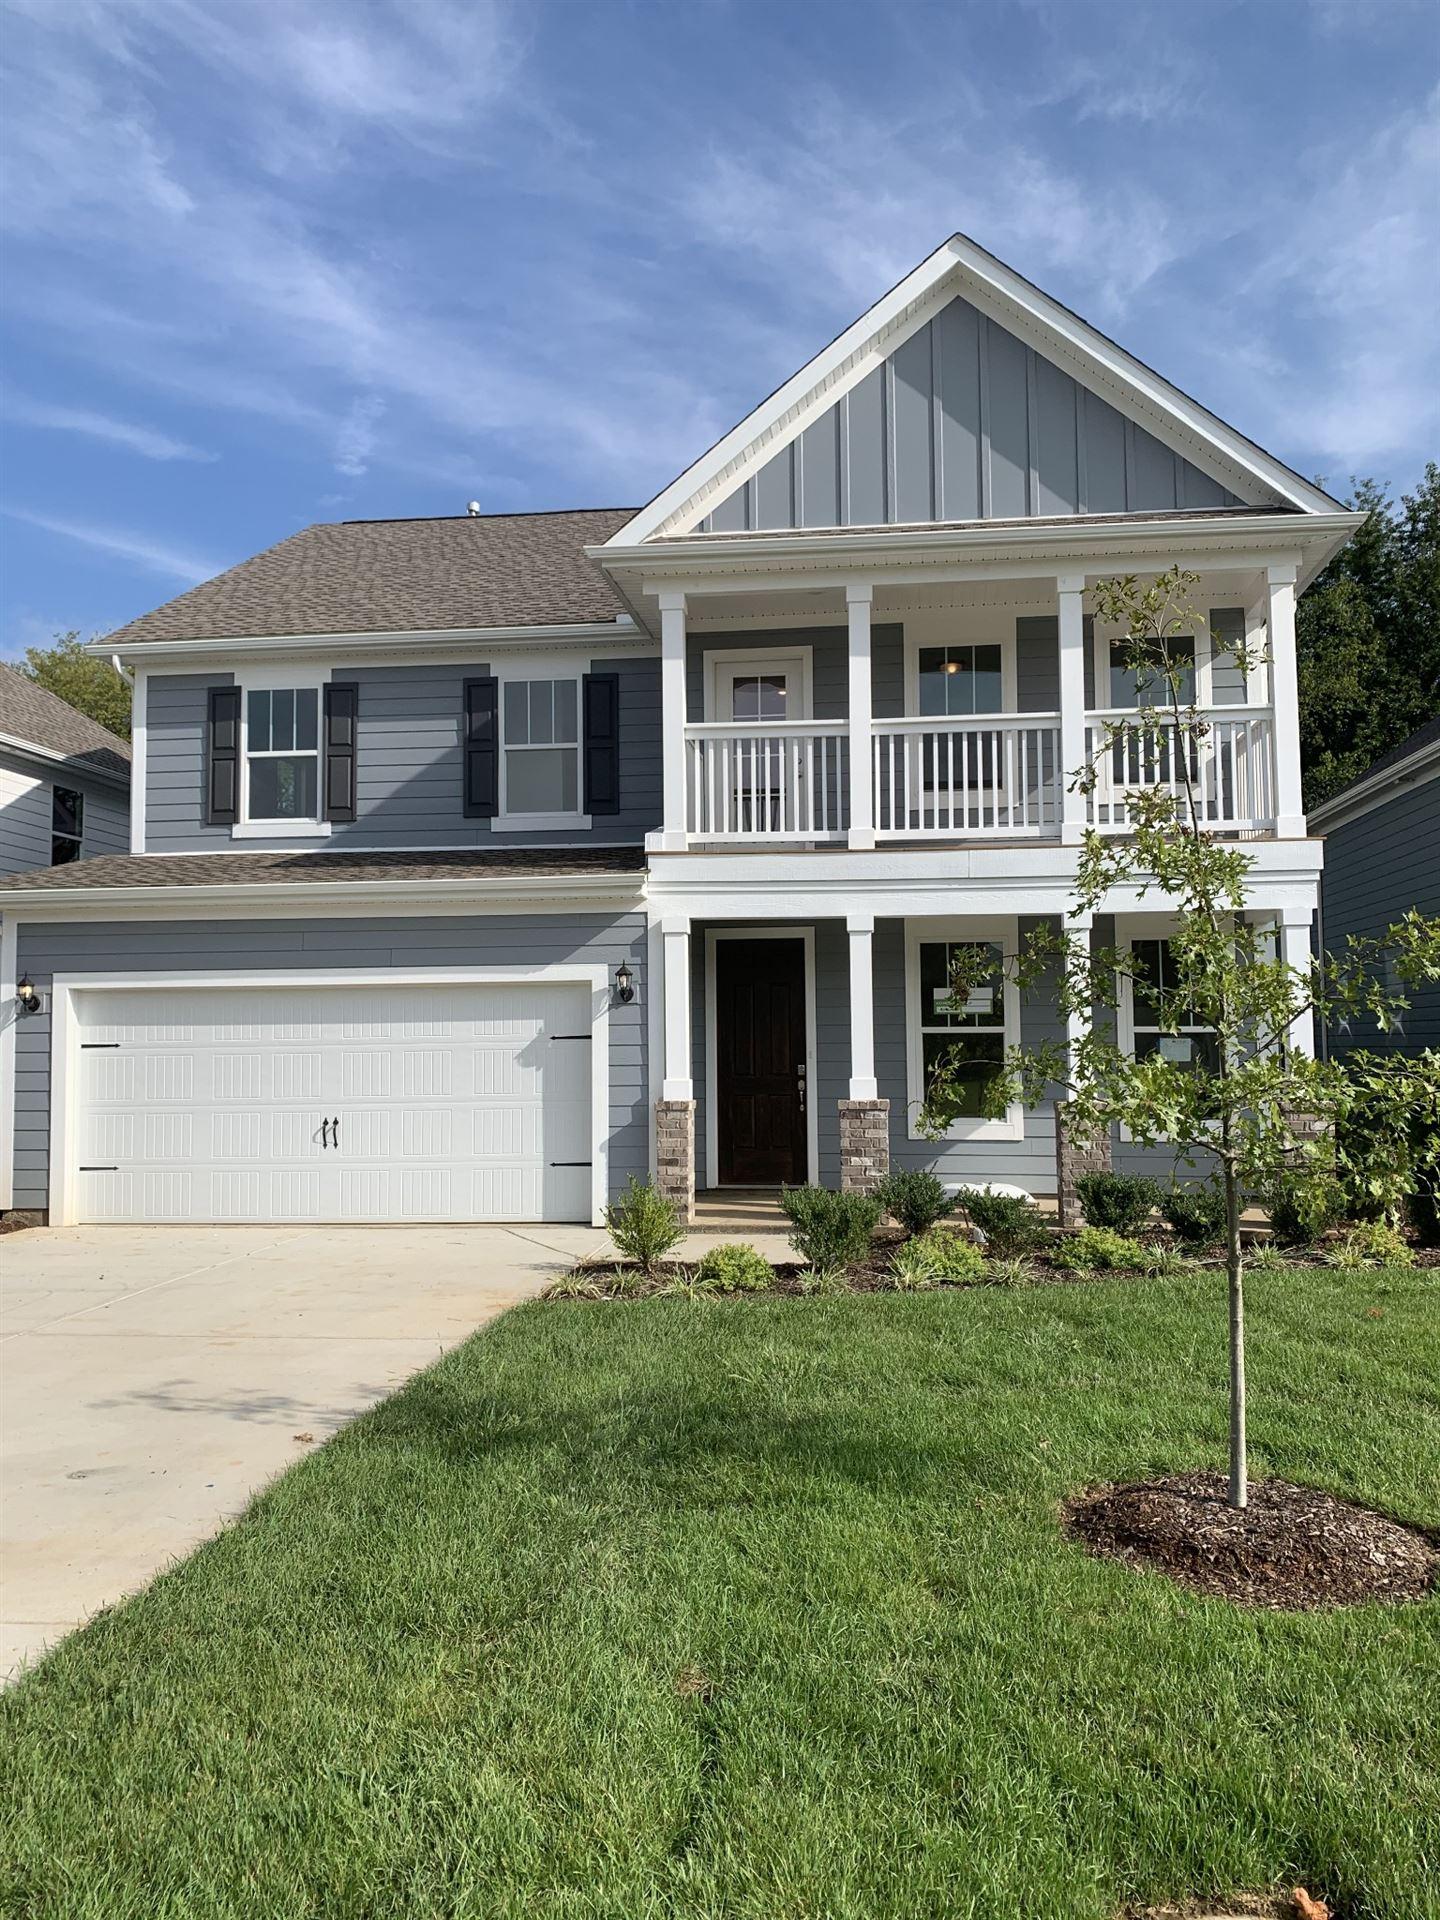 5432 Pointer Place Lot 34, Murfreesboro, TN 37129 - MLS#: 2189816